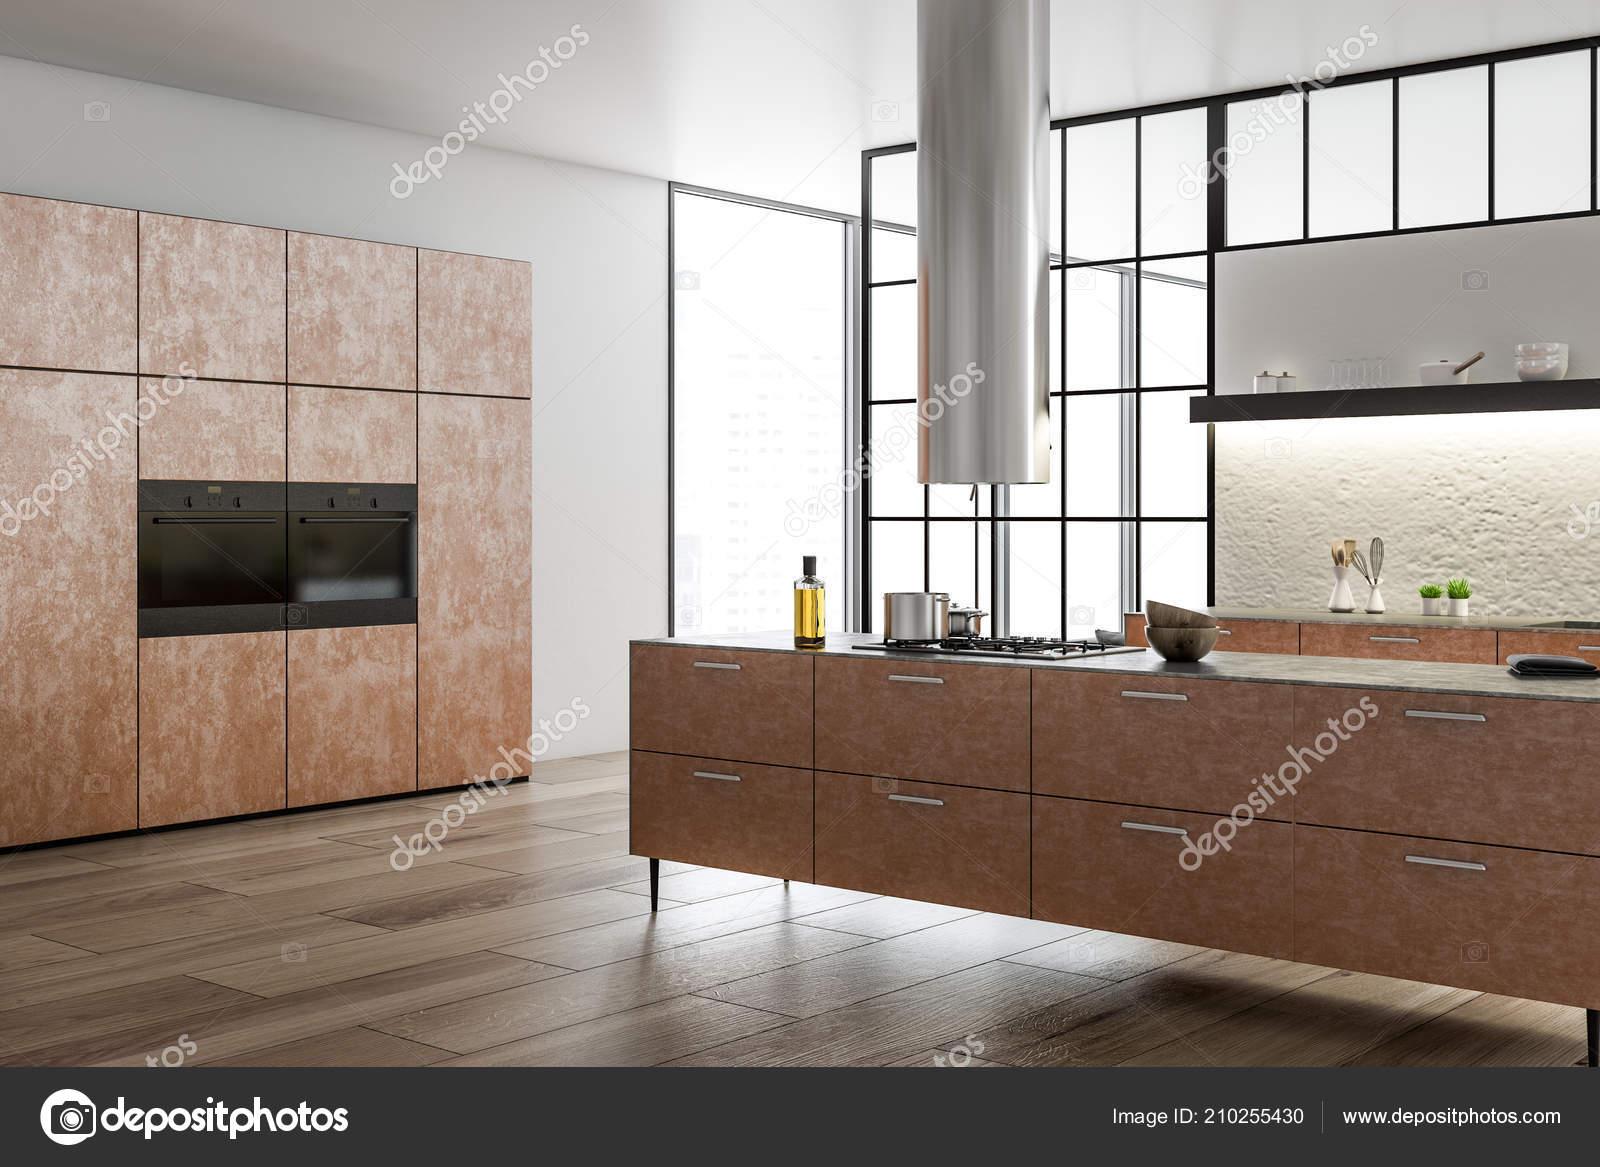 tile flooring kitchen aunt jemima curtains 现代灰色墙壁厨房角落与全景窗口一个六角灰色瓷砖地板和褐色台面与修造在 现代灰色墙壁厨房角落与全景窗口一个六角灰色瓷砖地板和褐色台面